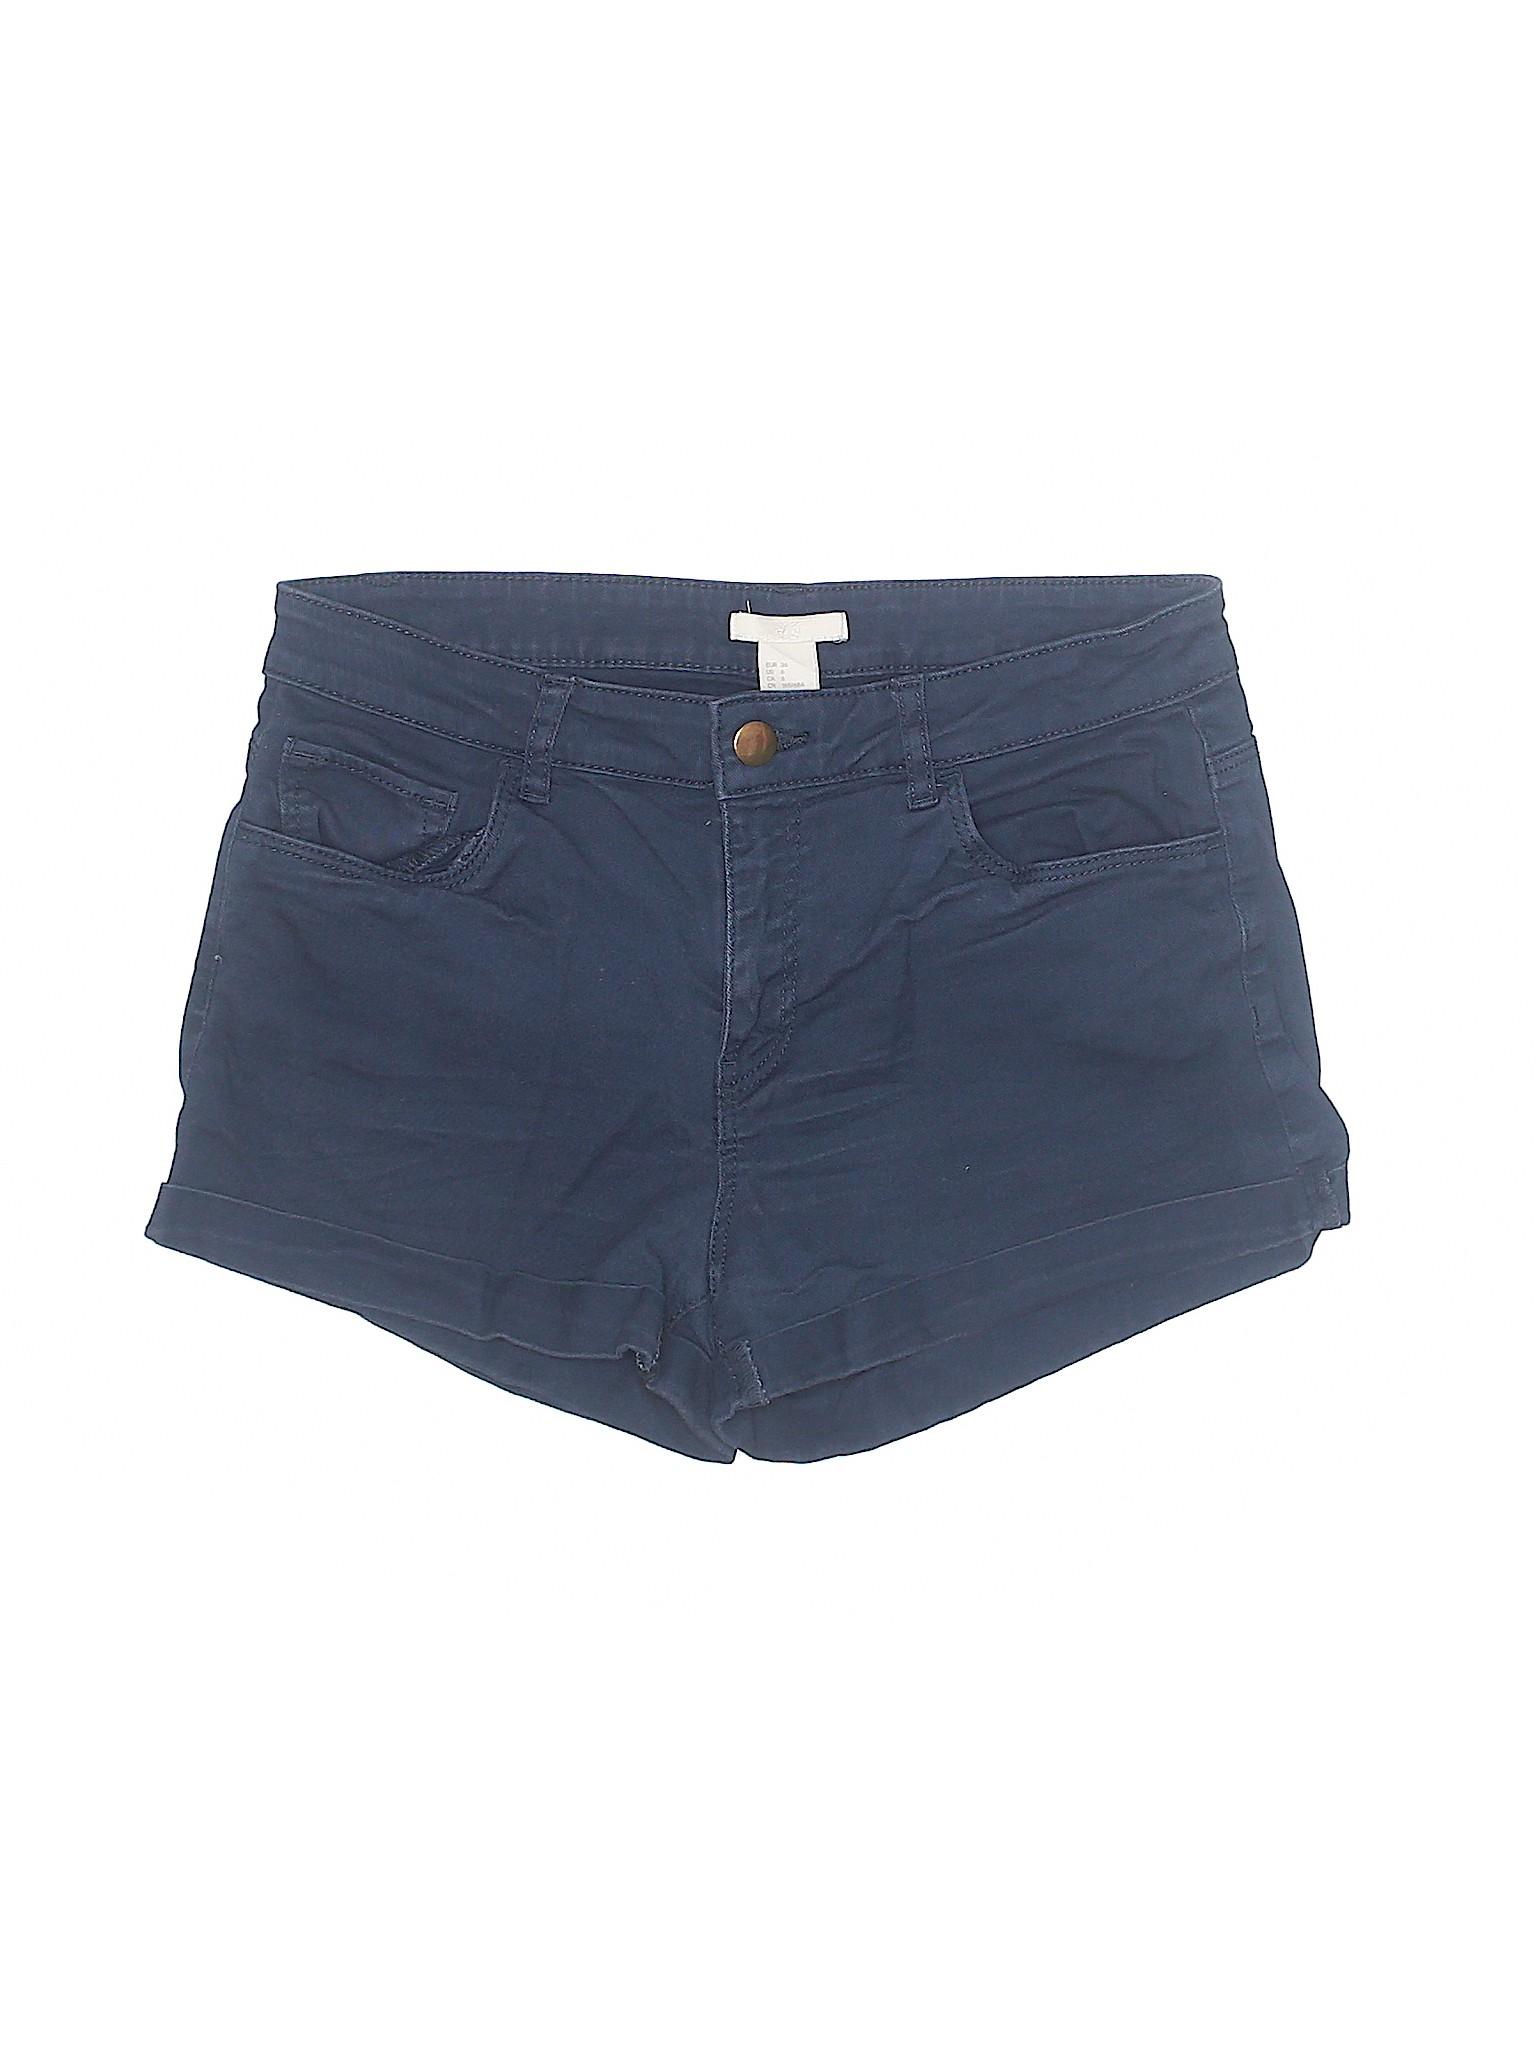 Denim Shorts amp;M Boutique leisure H qwHFzt4